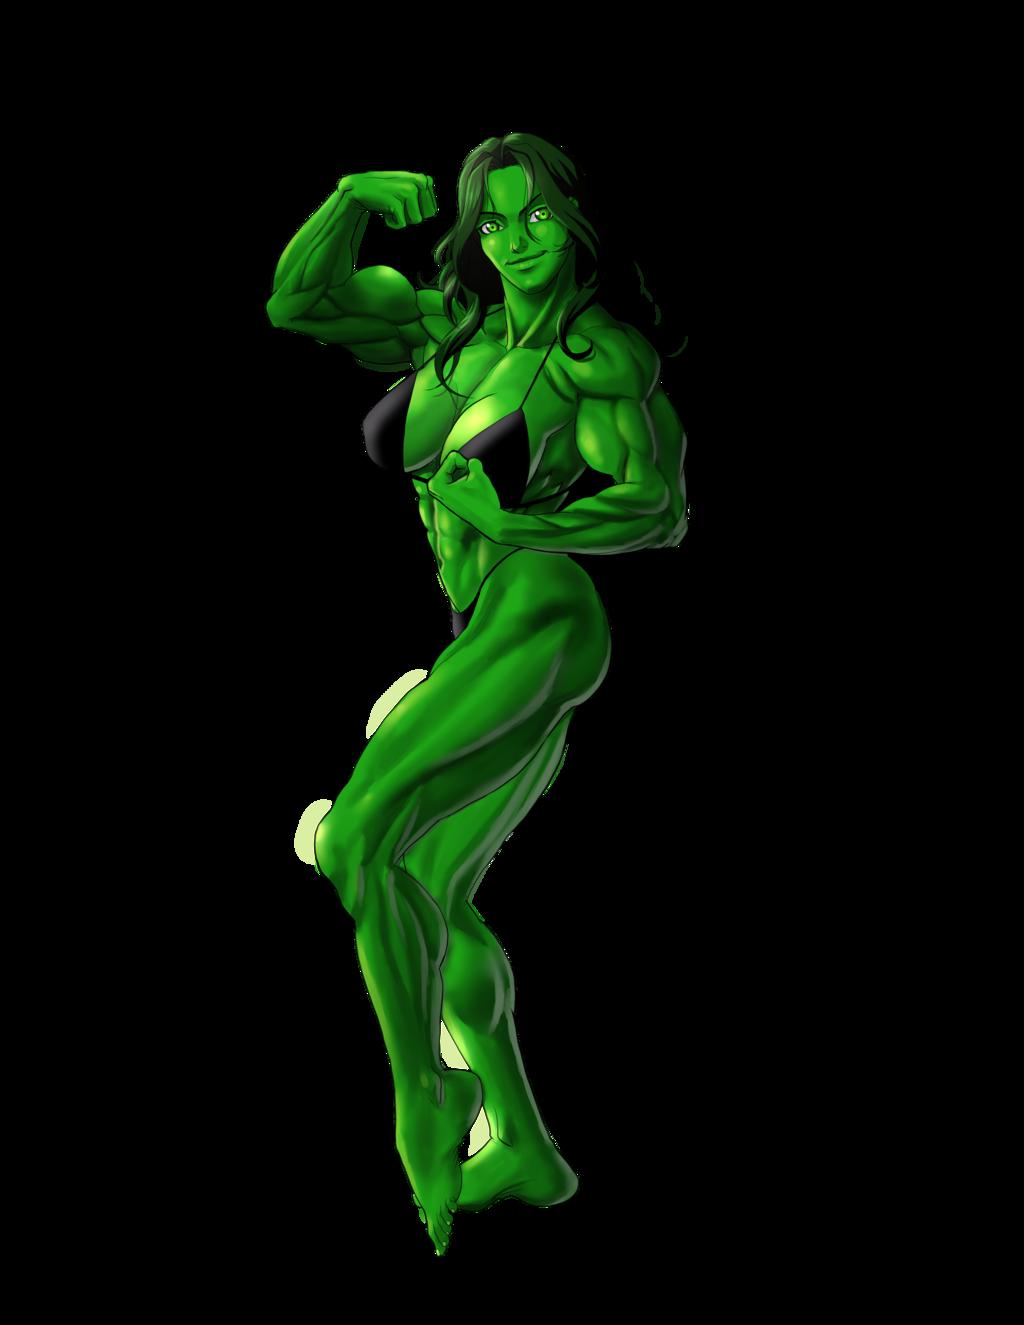 She Hulk PNG File - She Hulk PNG